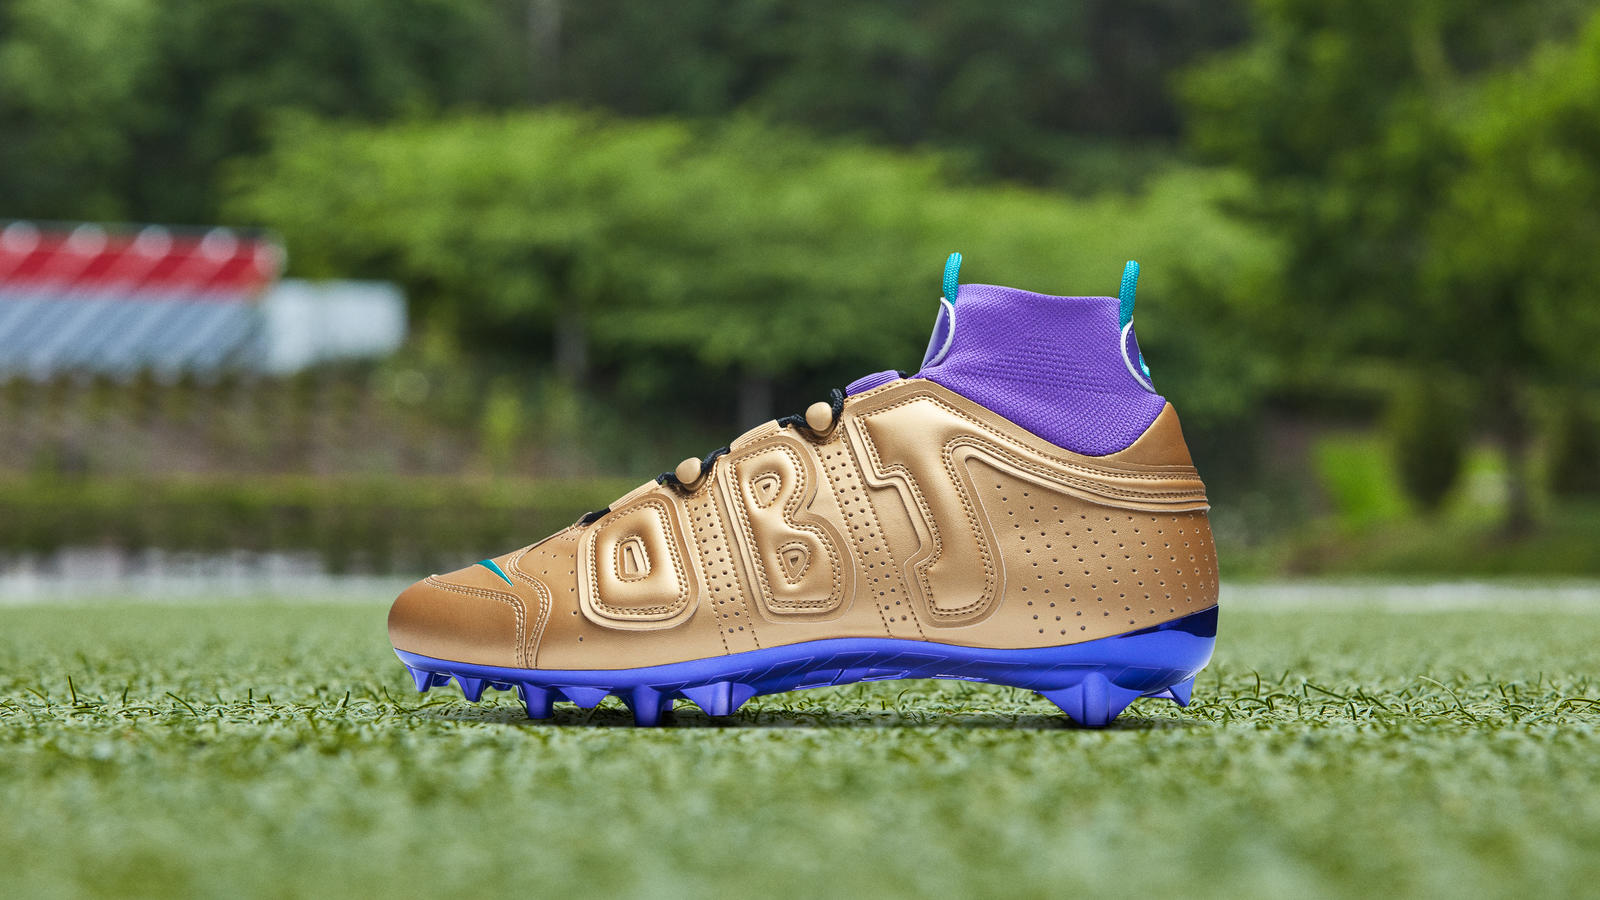 Nike Odell Beckham Jr. Pregame Cleats